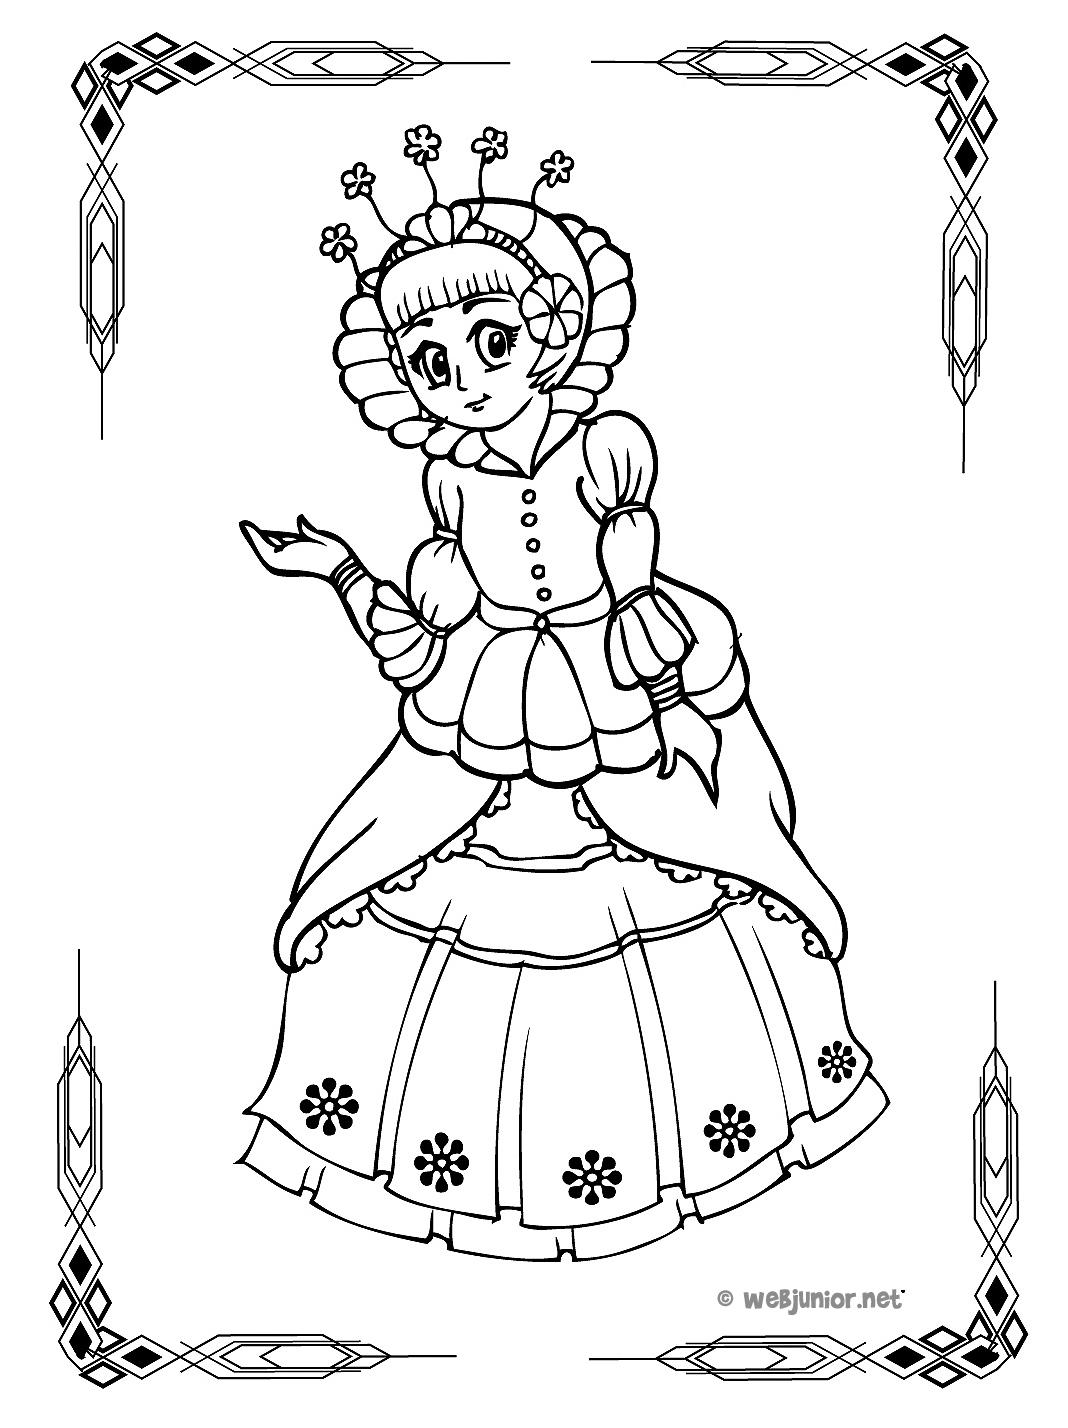 Dessin Chateau Princesse - Primanyc à Coloriage Chateau Princesse